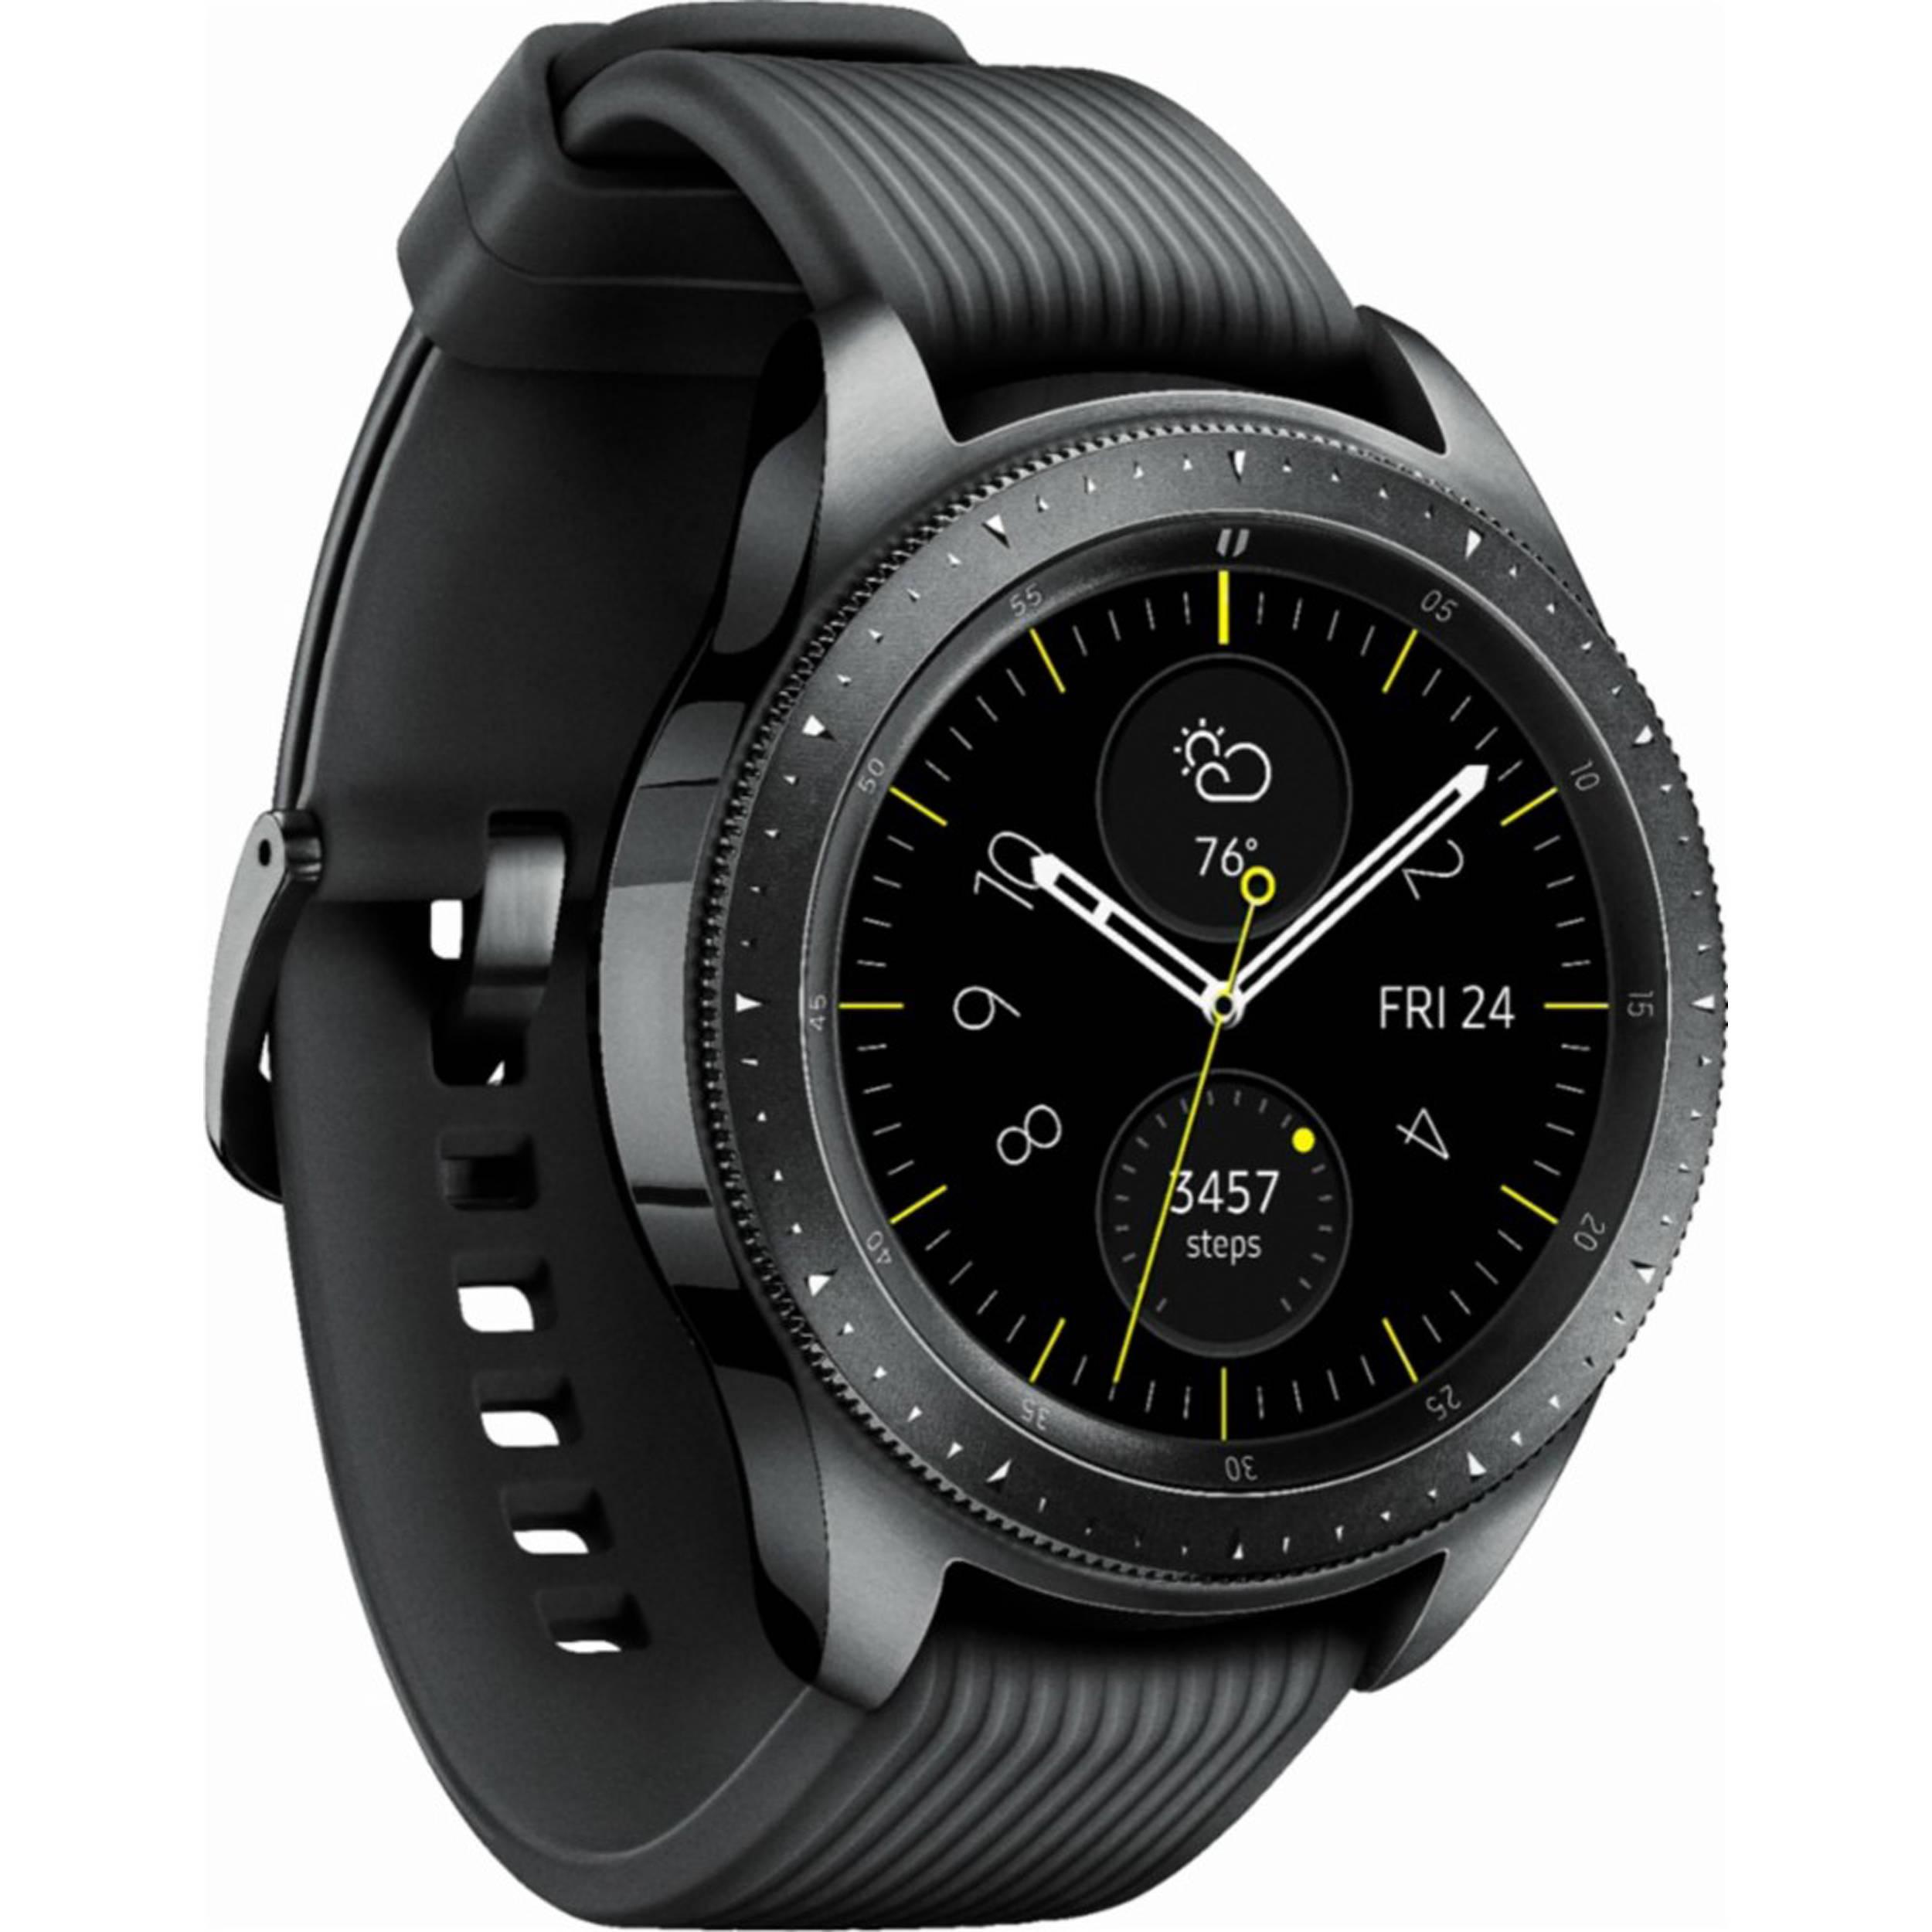 aa0e122cb Samsung Galaxy Watch SM-R810NZKAXAR B&H Photo Video